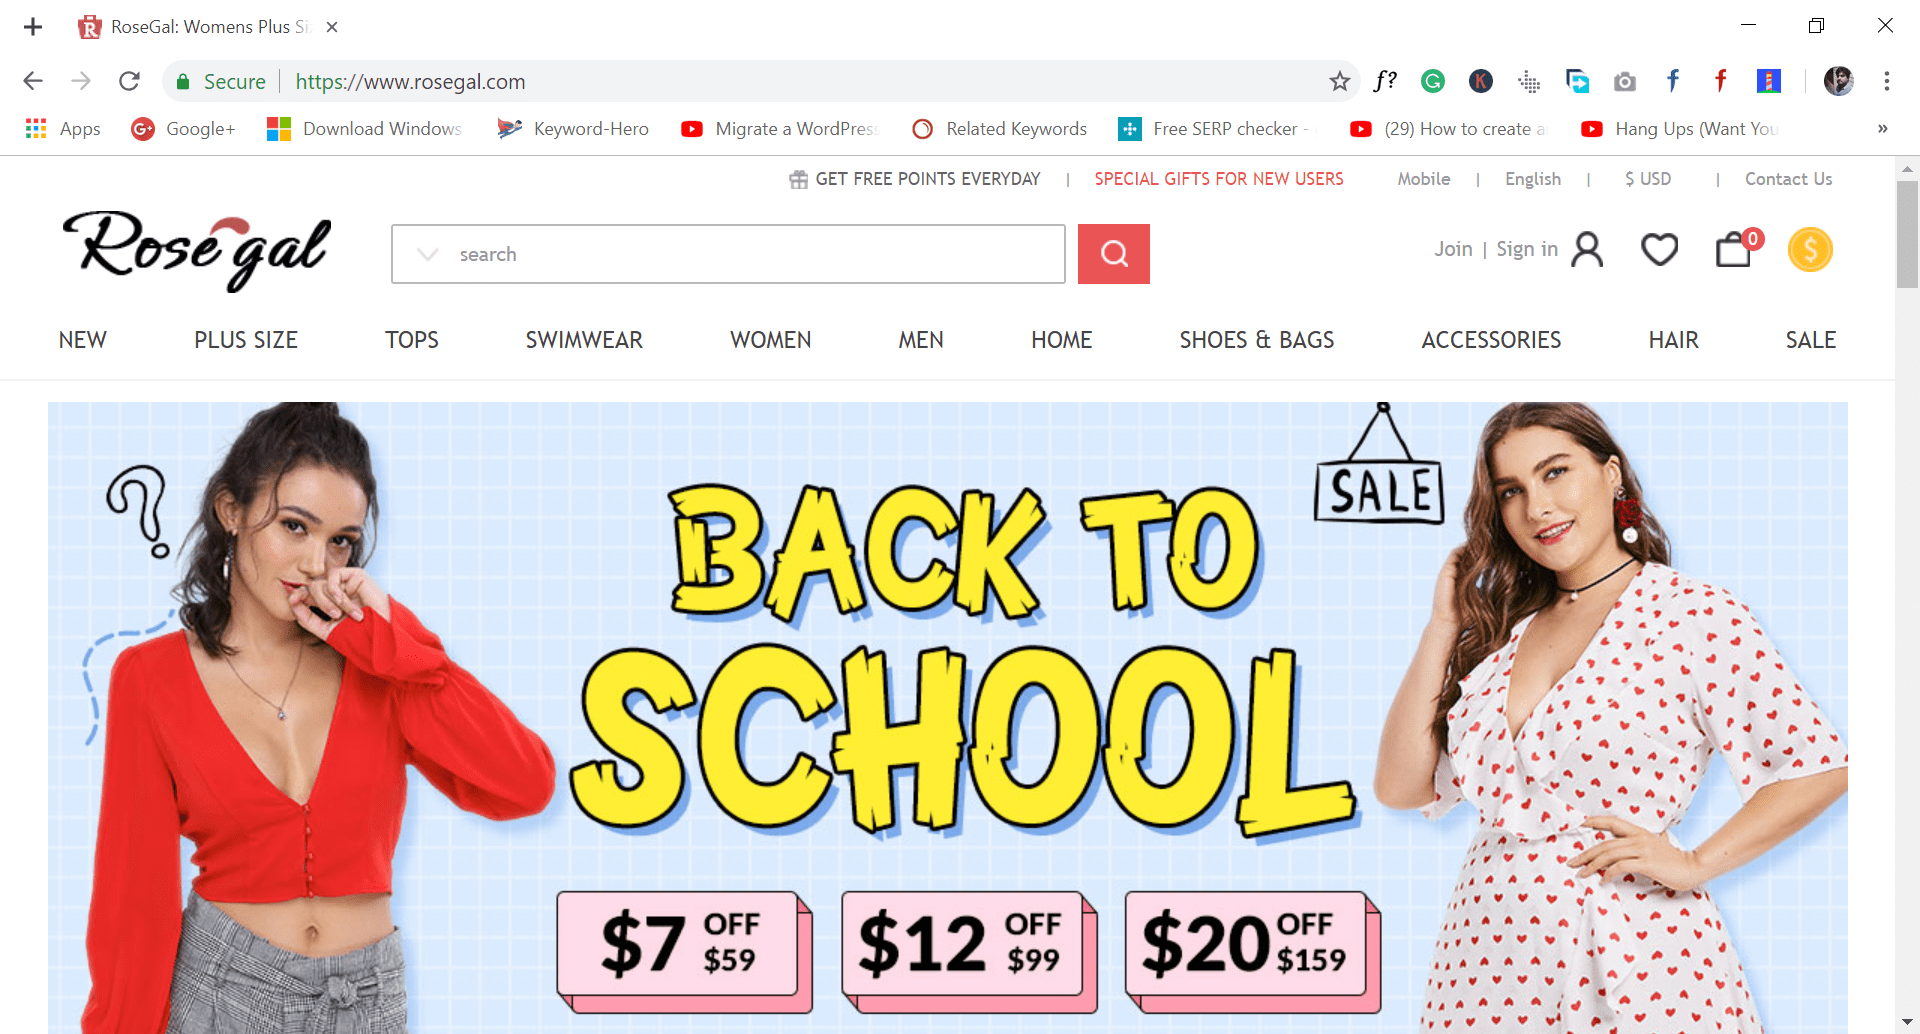 poppin - site like wish.com